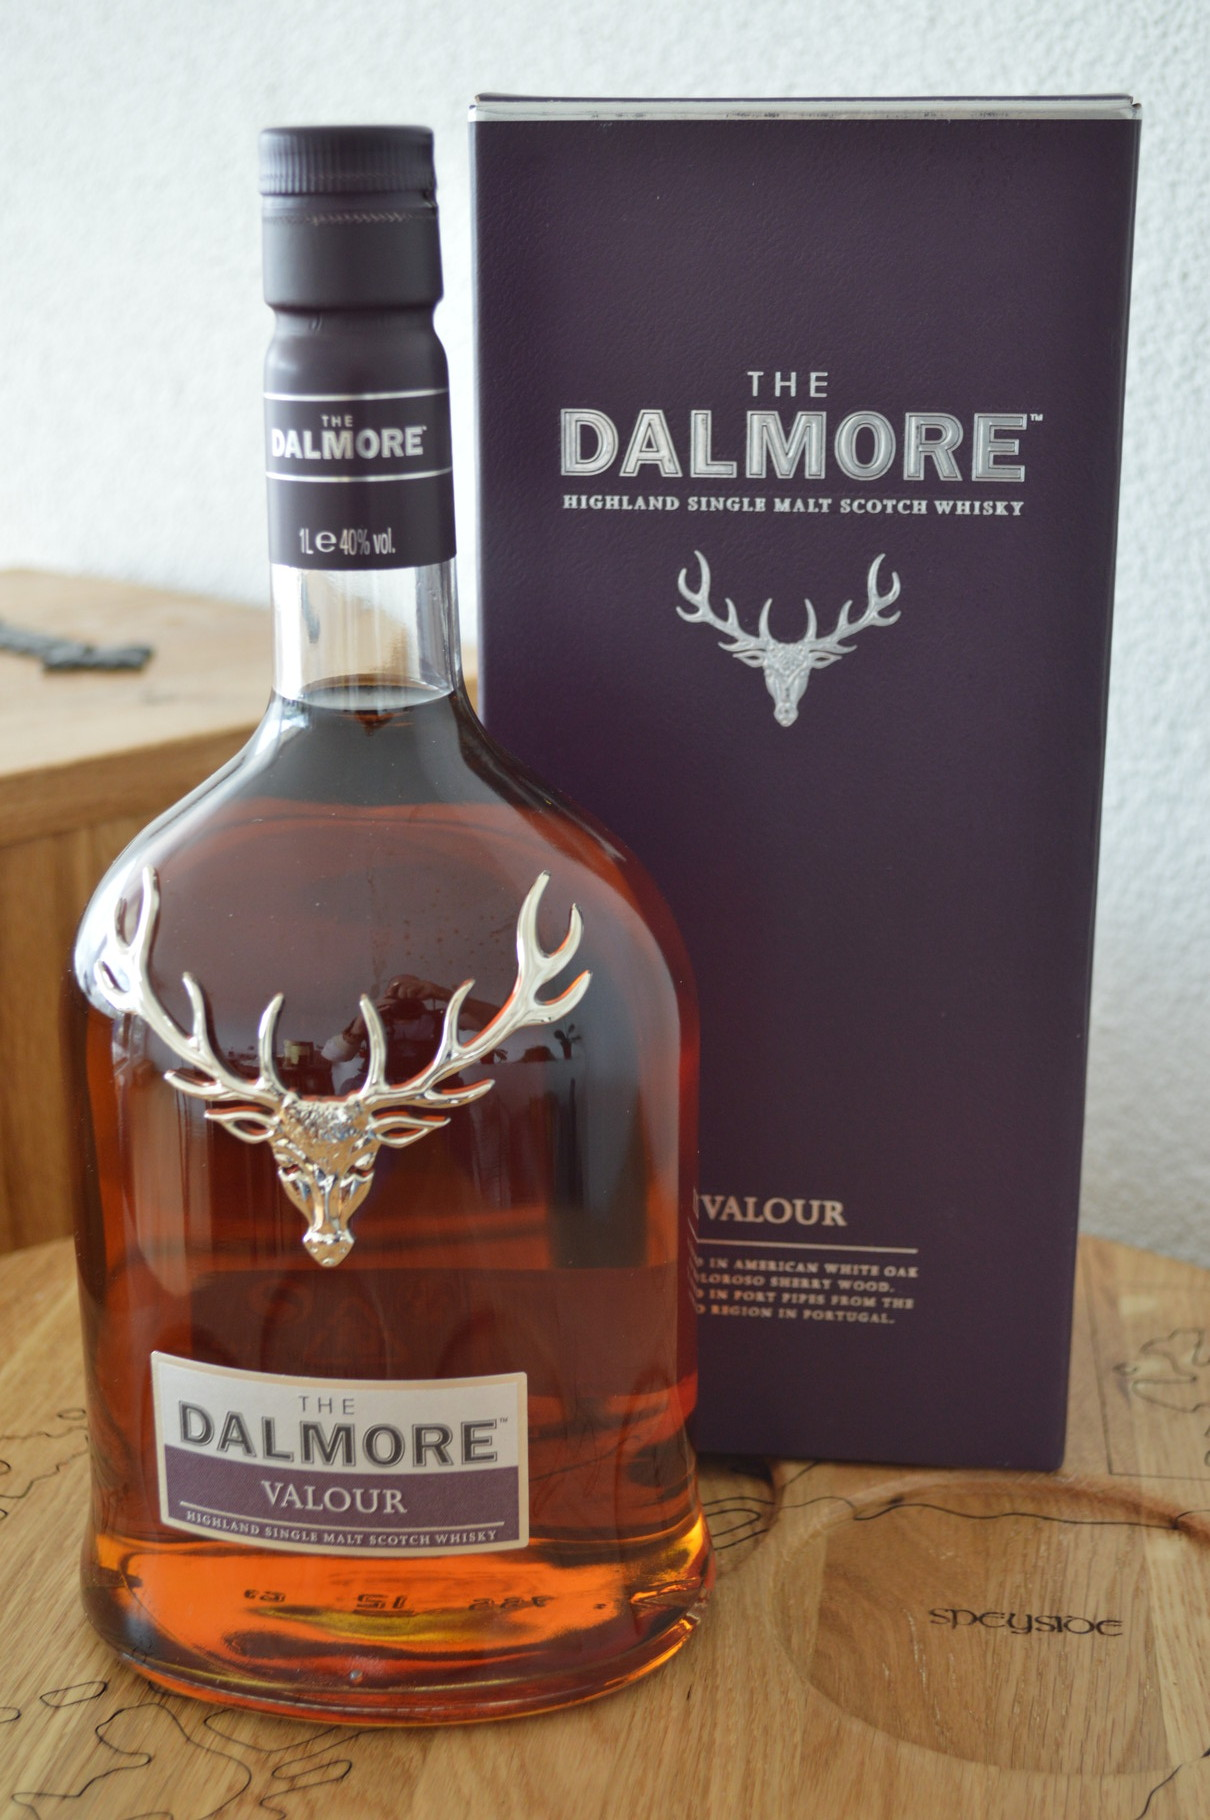 HIGHLANDS - Dalmore* - Bottler: Original - 100cl - 40% - Valour